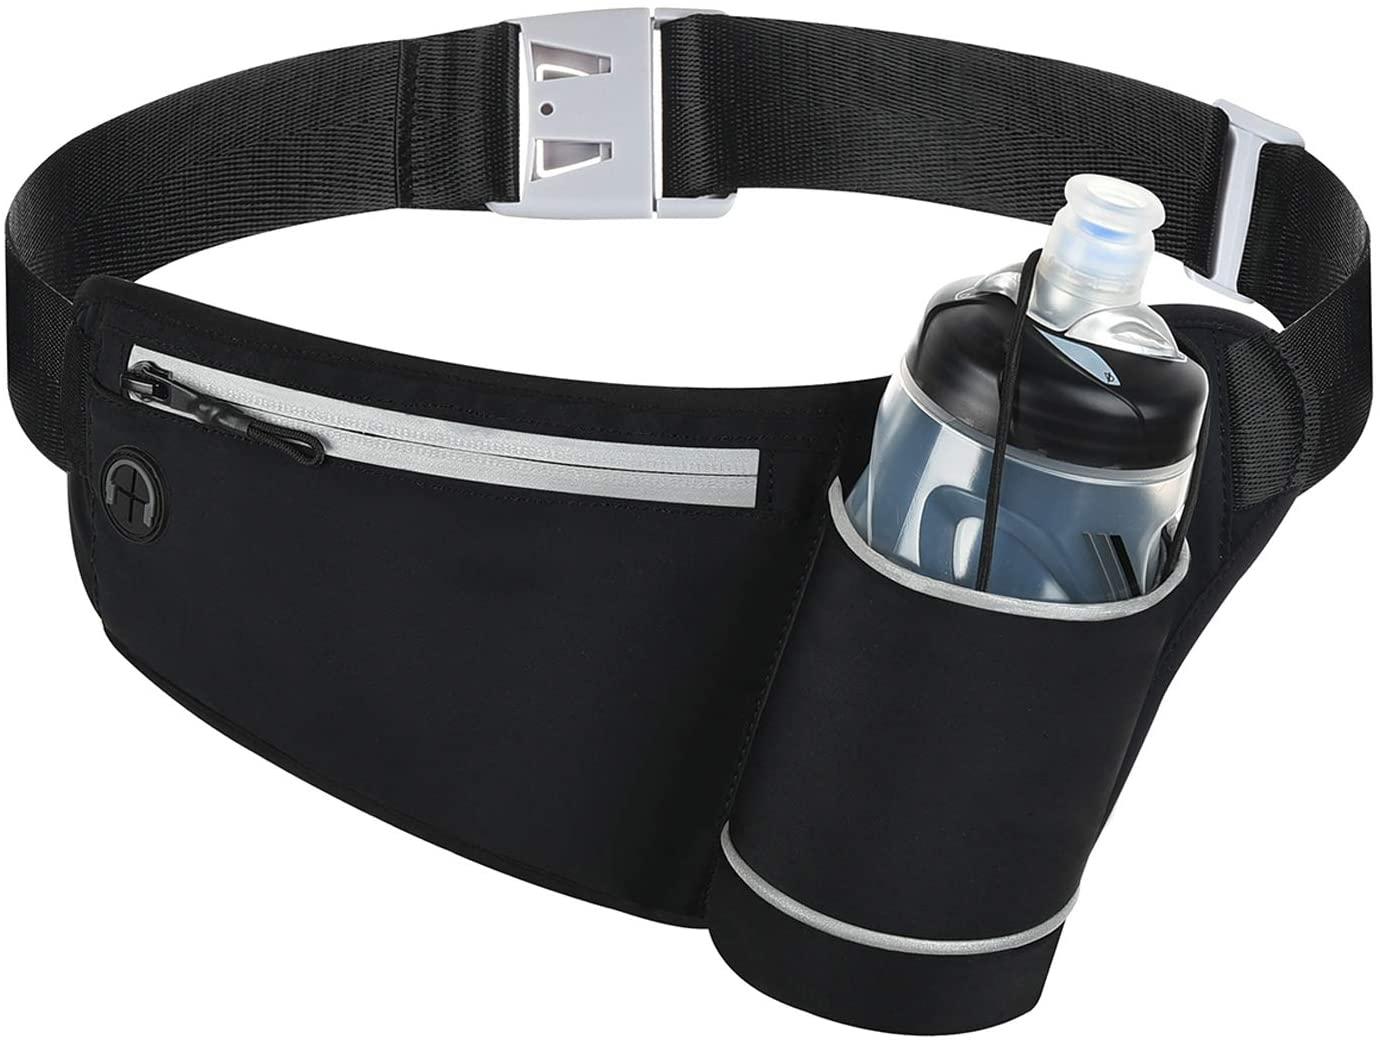 ChangYou Running Waist Pack Belt Bag with Water Bottle Holder Reflective Fanny Pack for Jogging Riding Walking